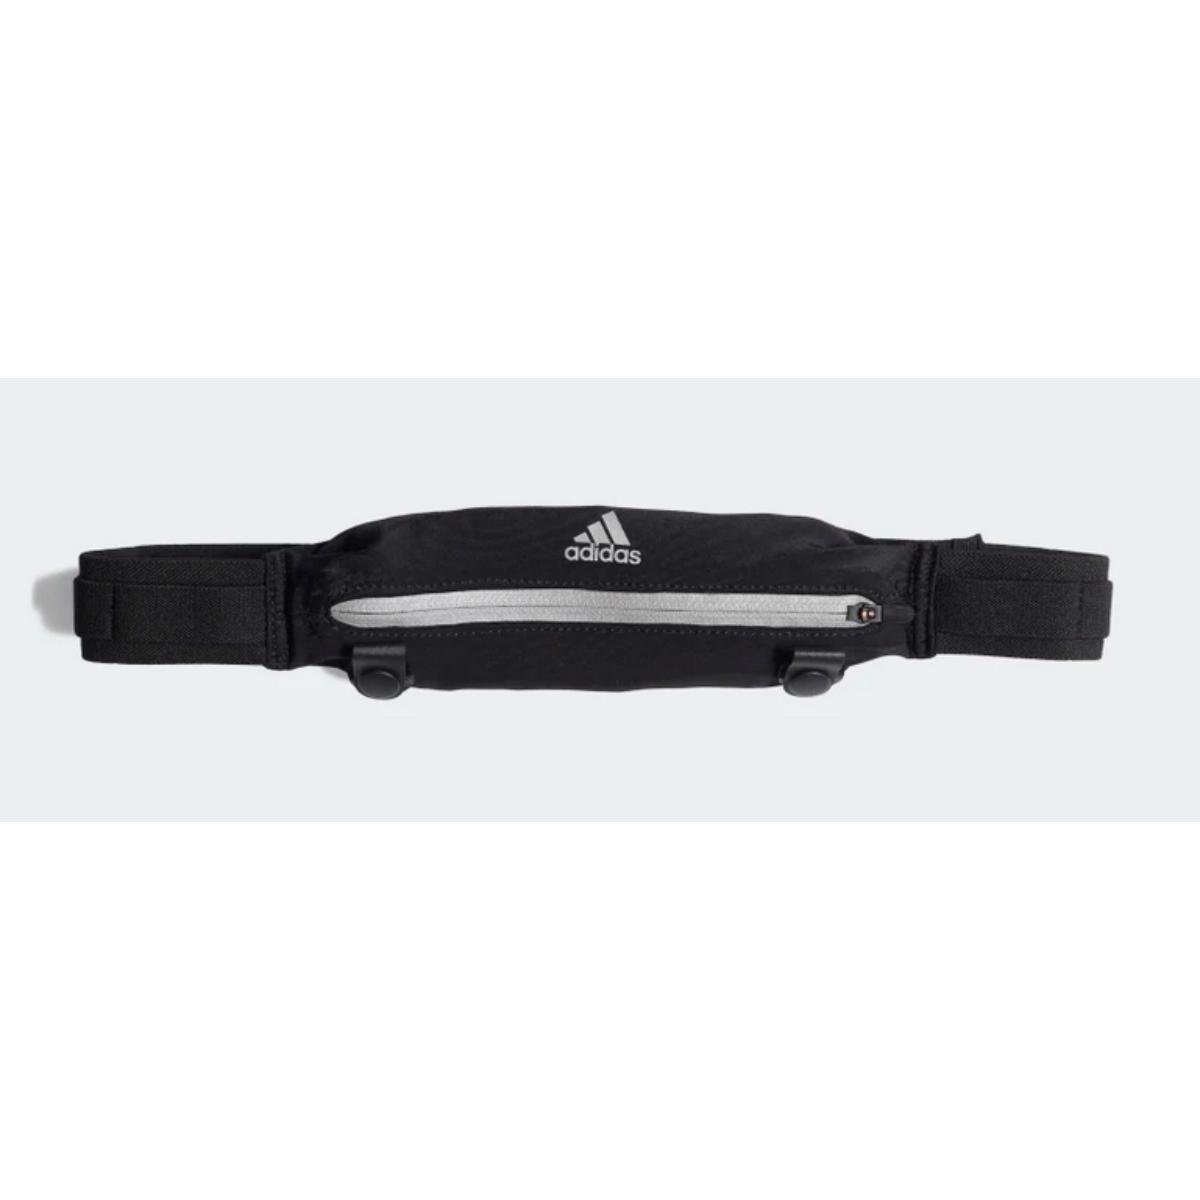 Cinto Unisex Adidas Fj4510 Run Belt Preto